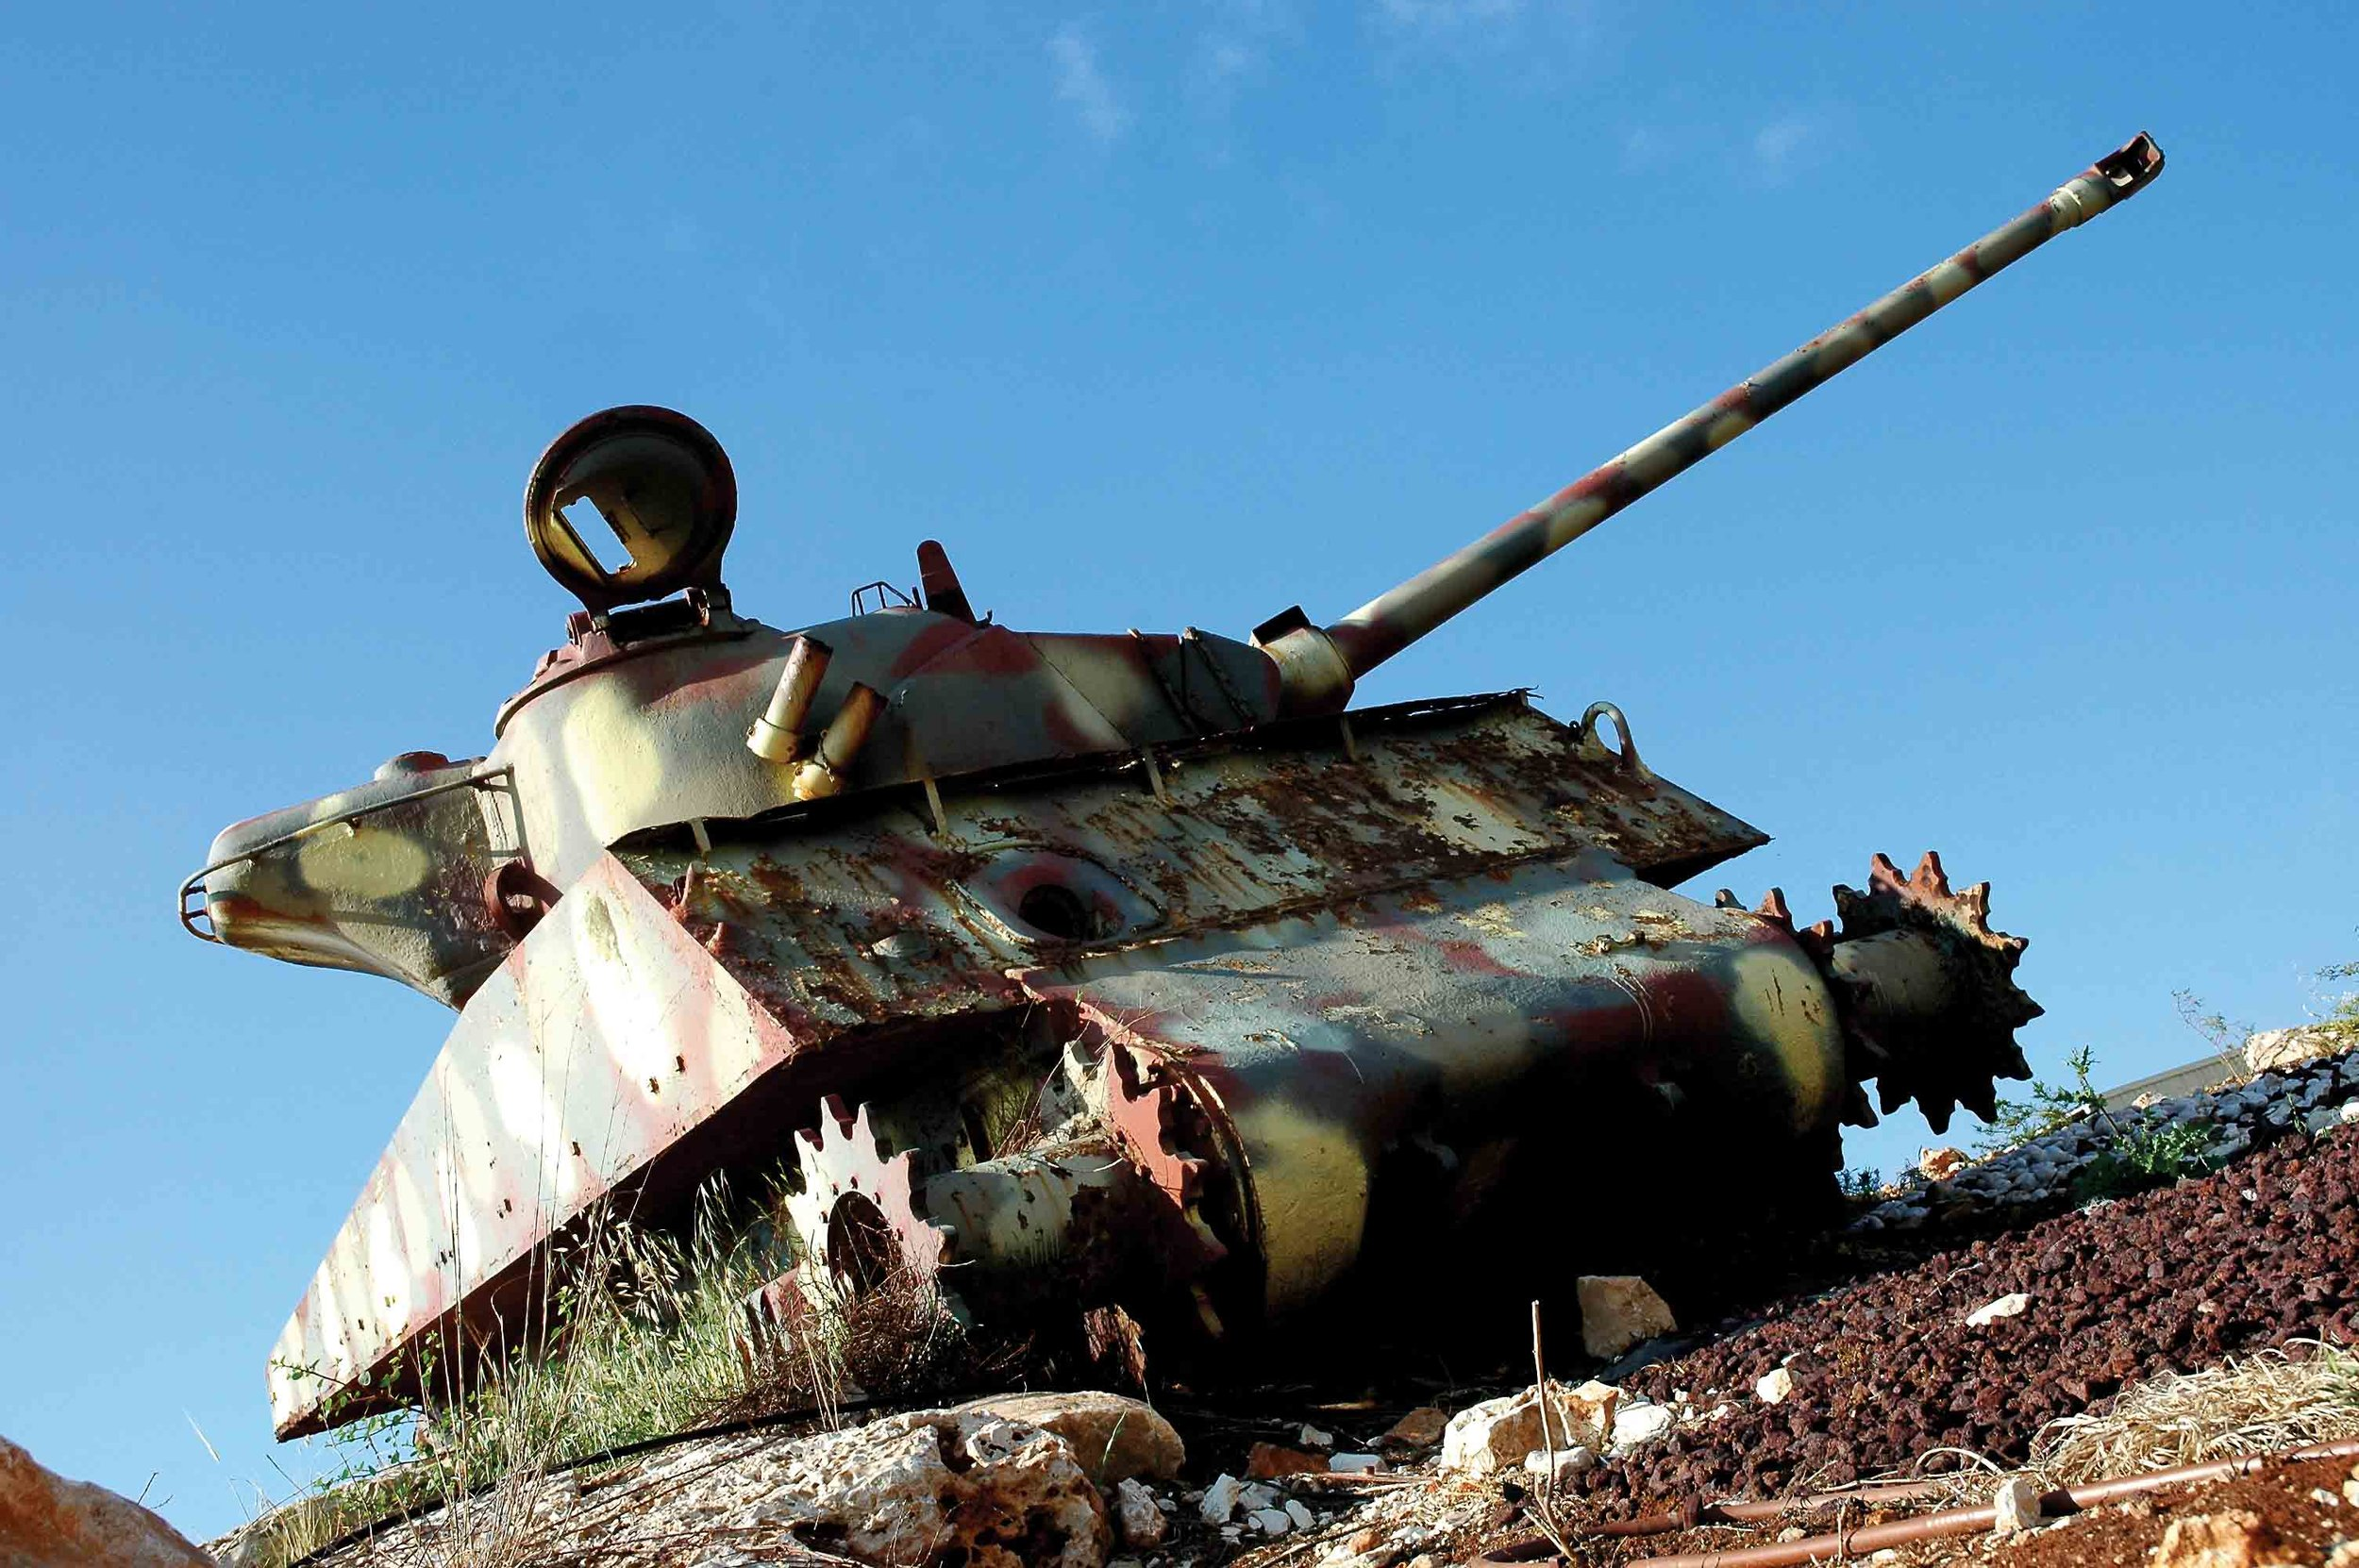 Tank: An Israeli military tank. © RAPHAEL LEVY